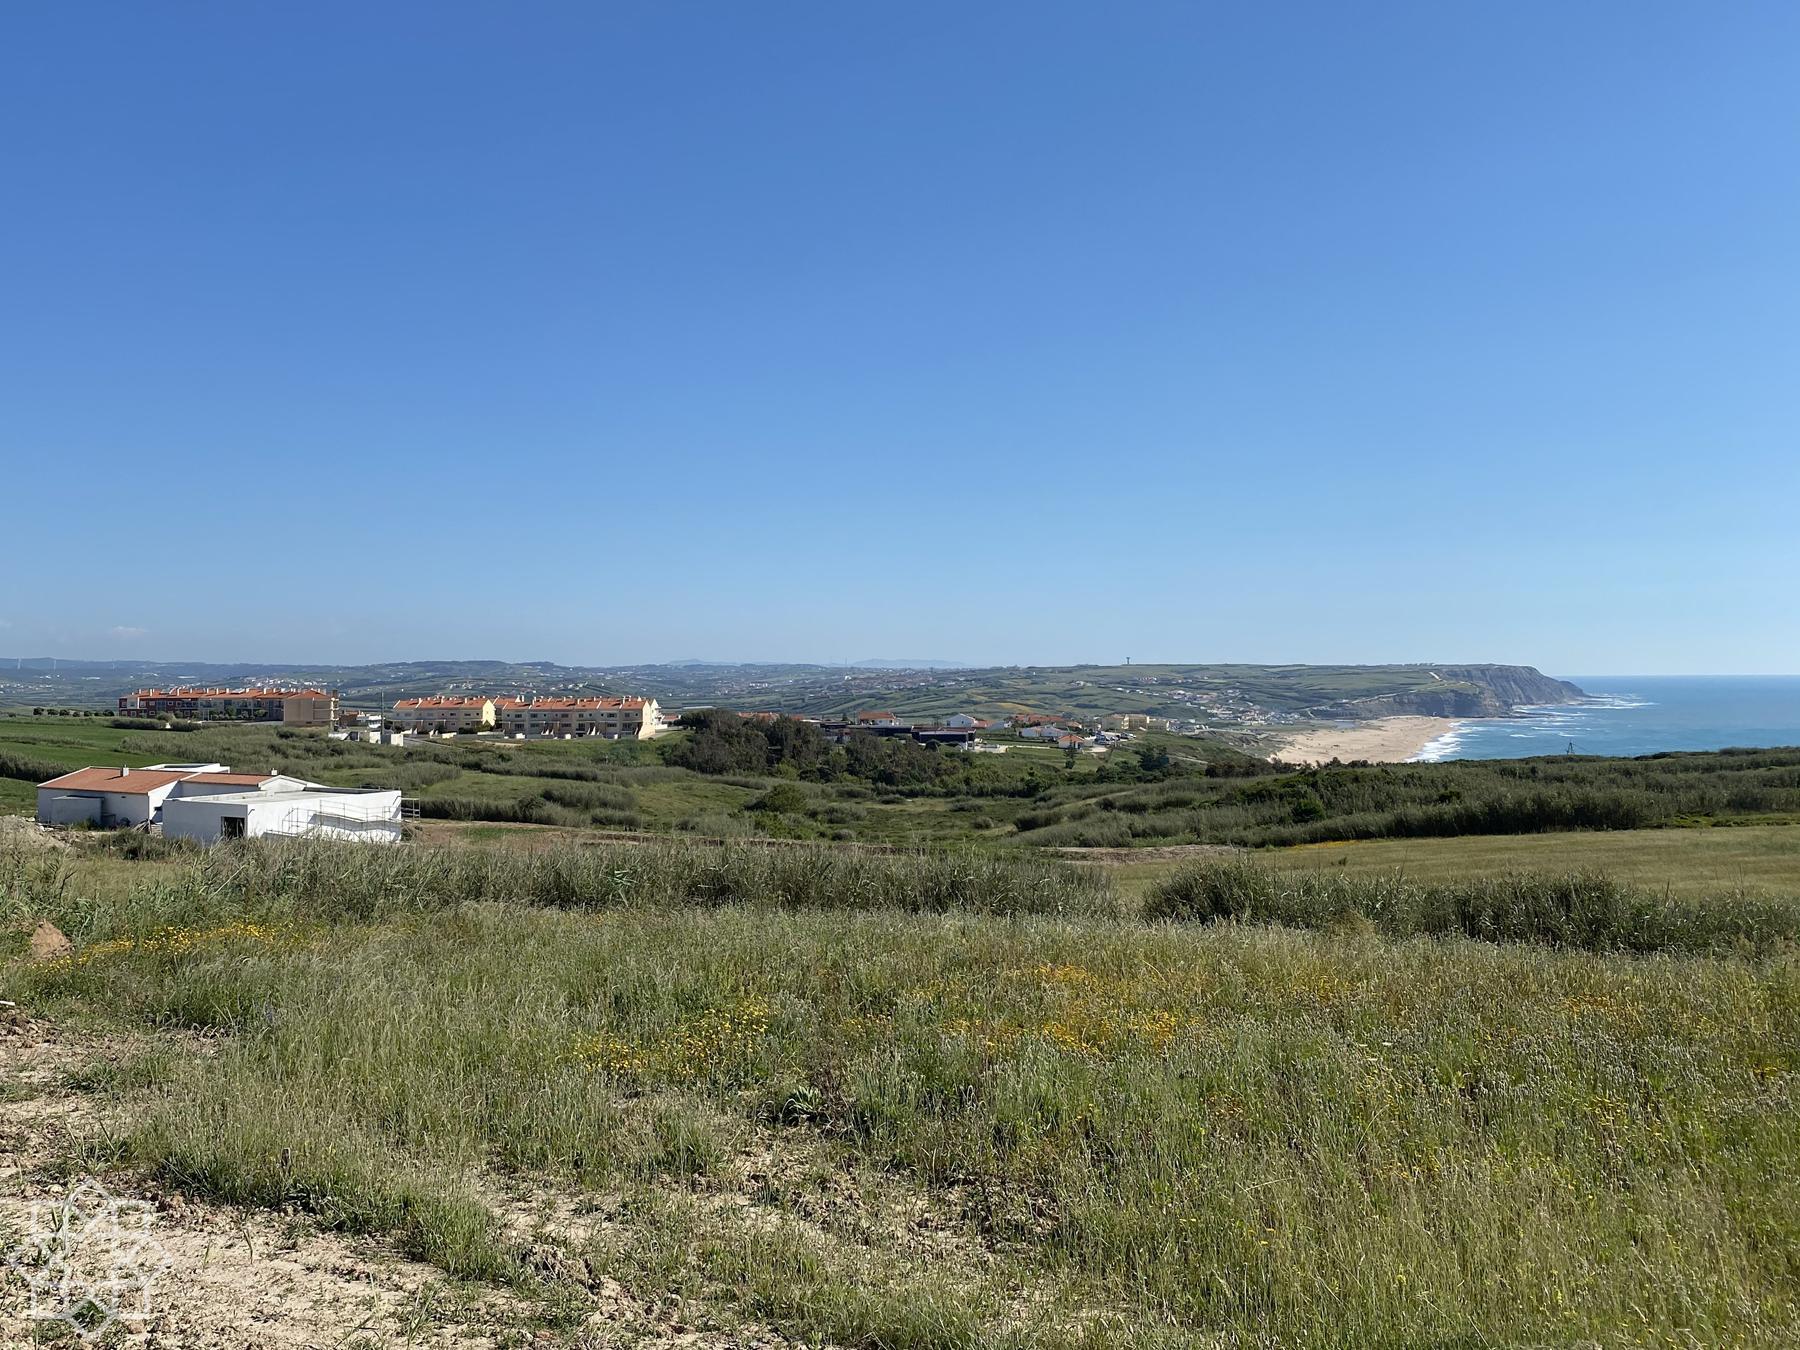 Praia Azul and surroundings